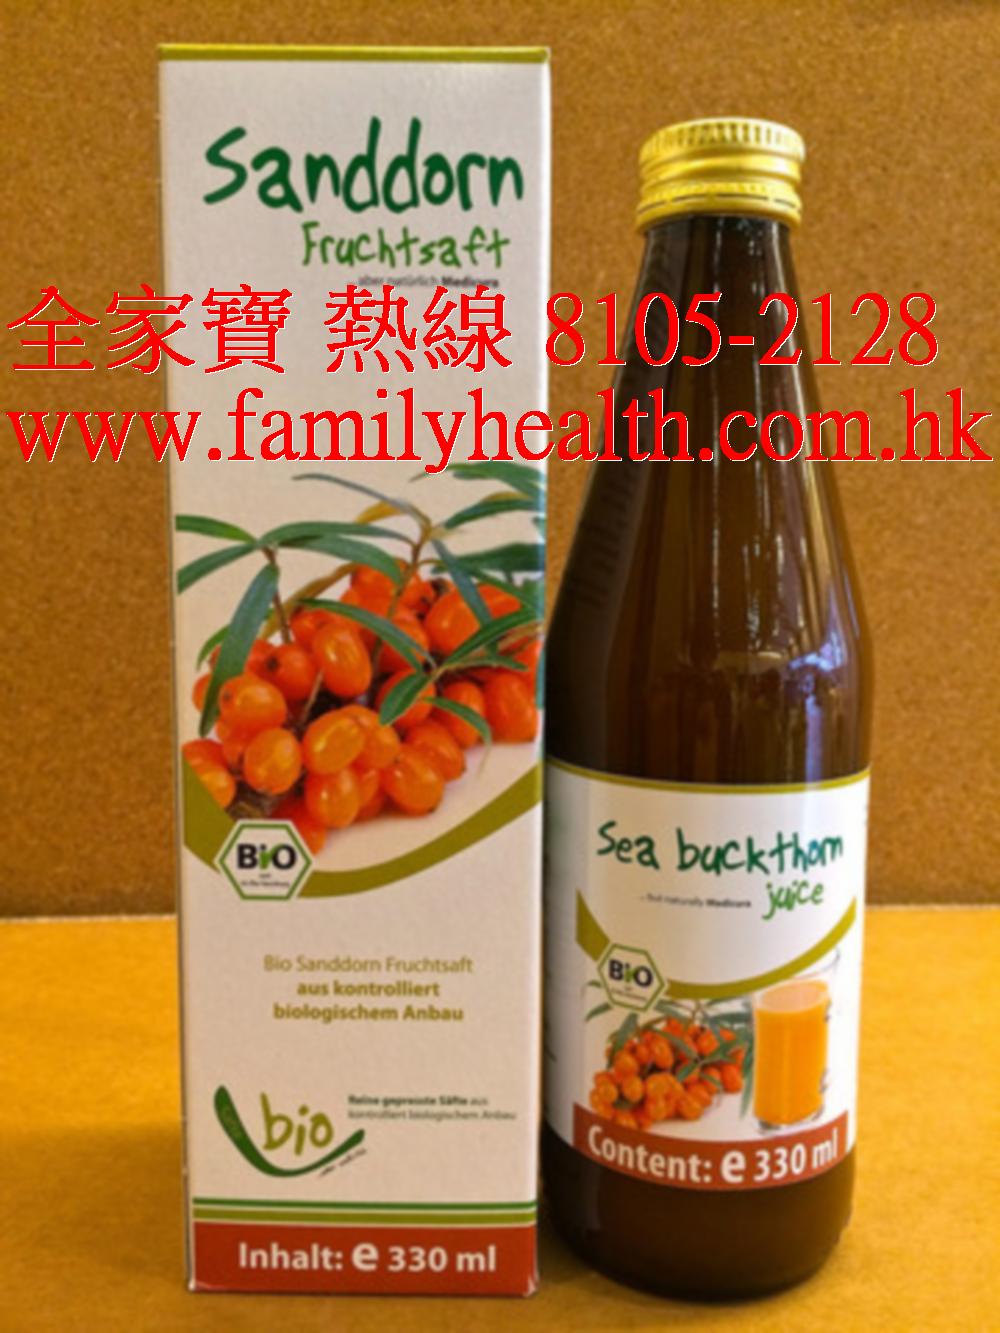 http://www.familyhealth.com.hk/files/full/668_0.png